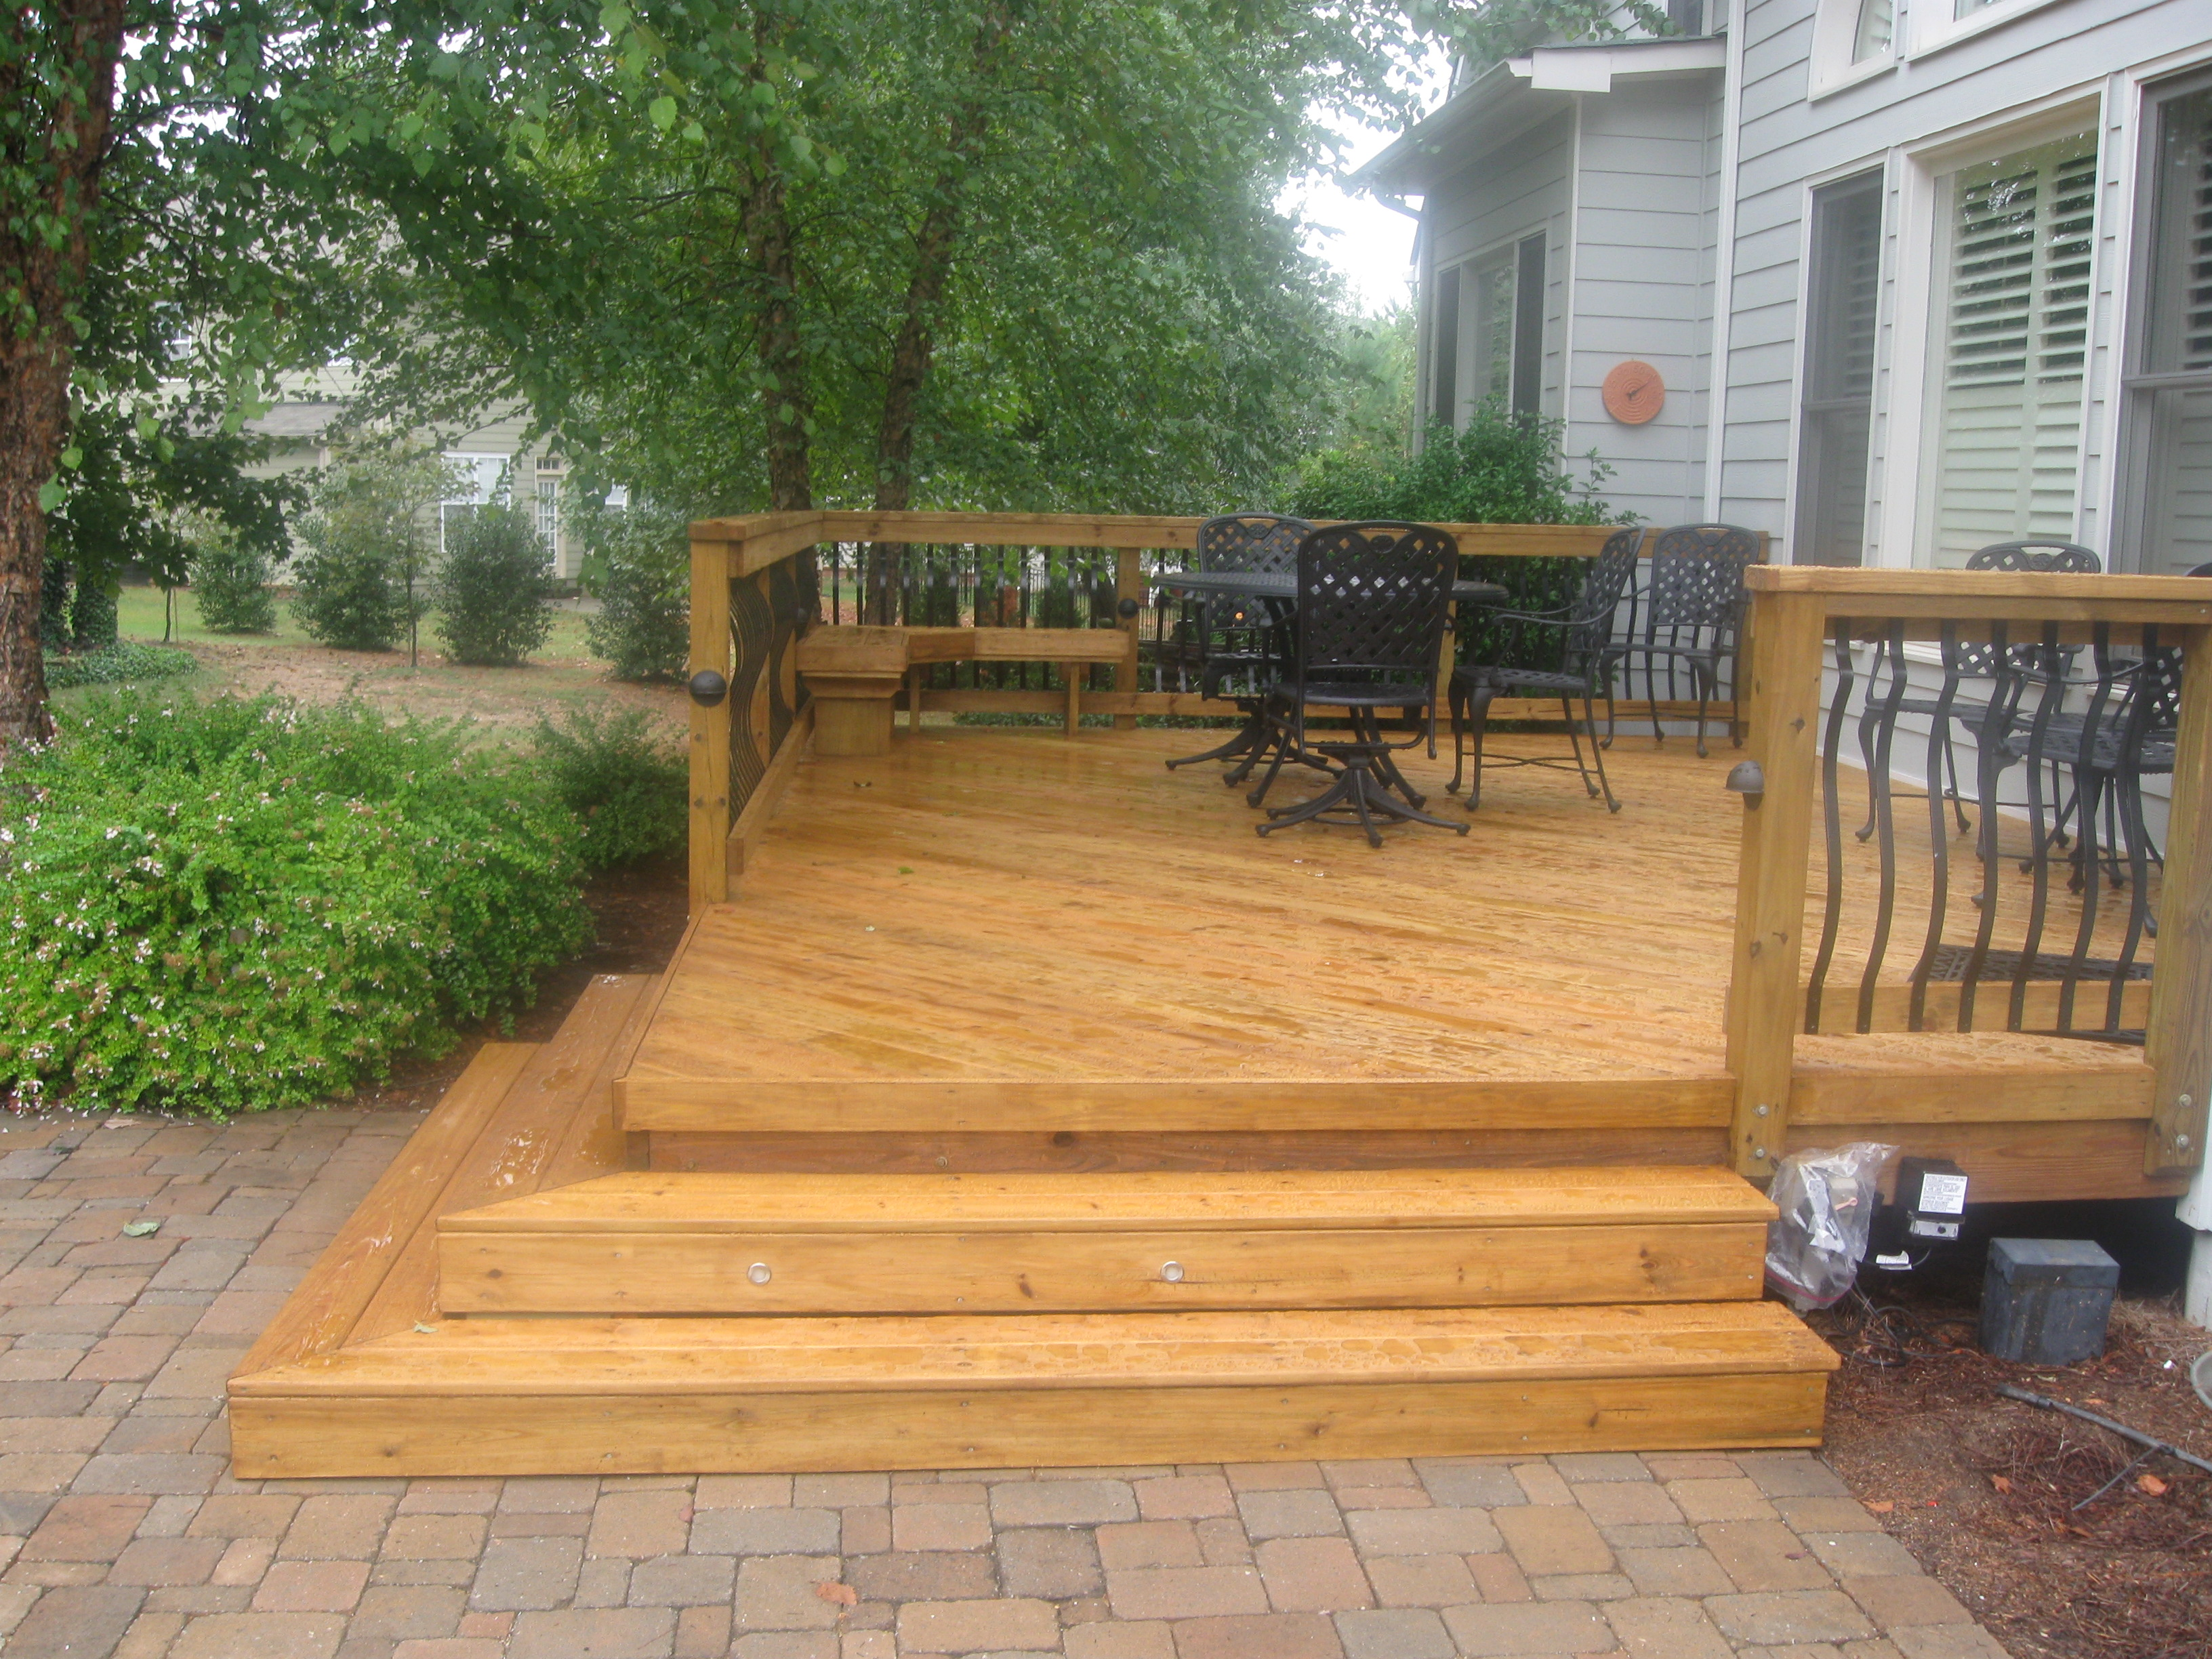 Patio Design, Small Decks, Open Stairs, Brick Patio